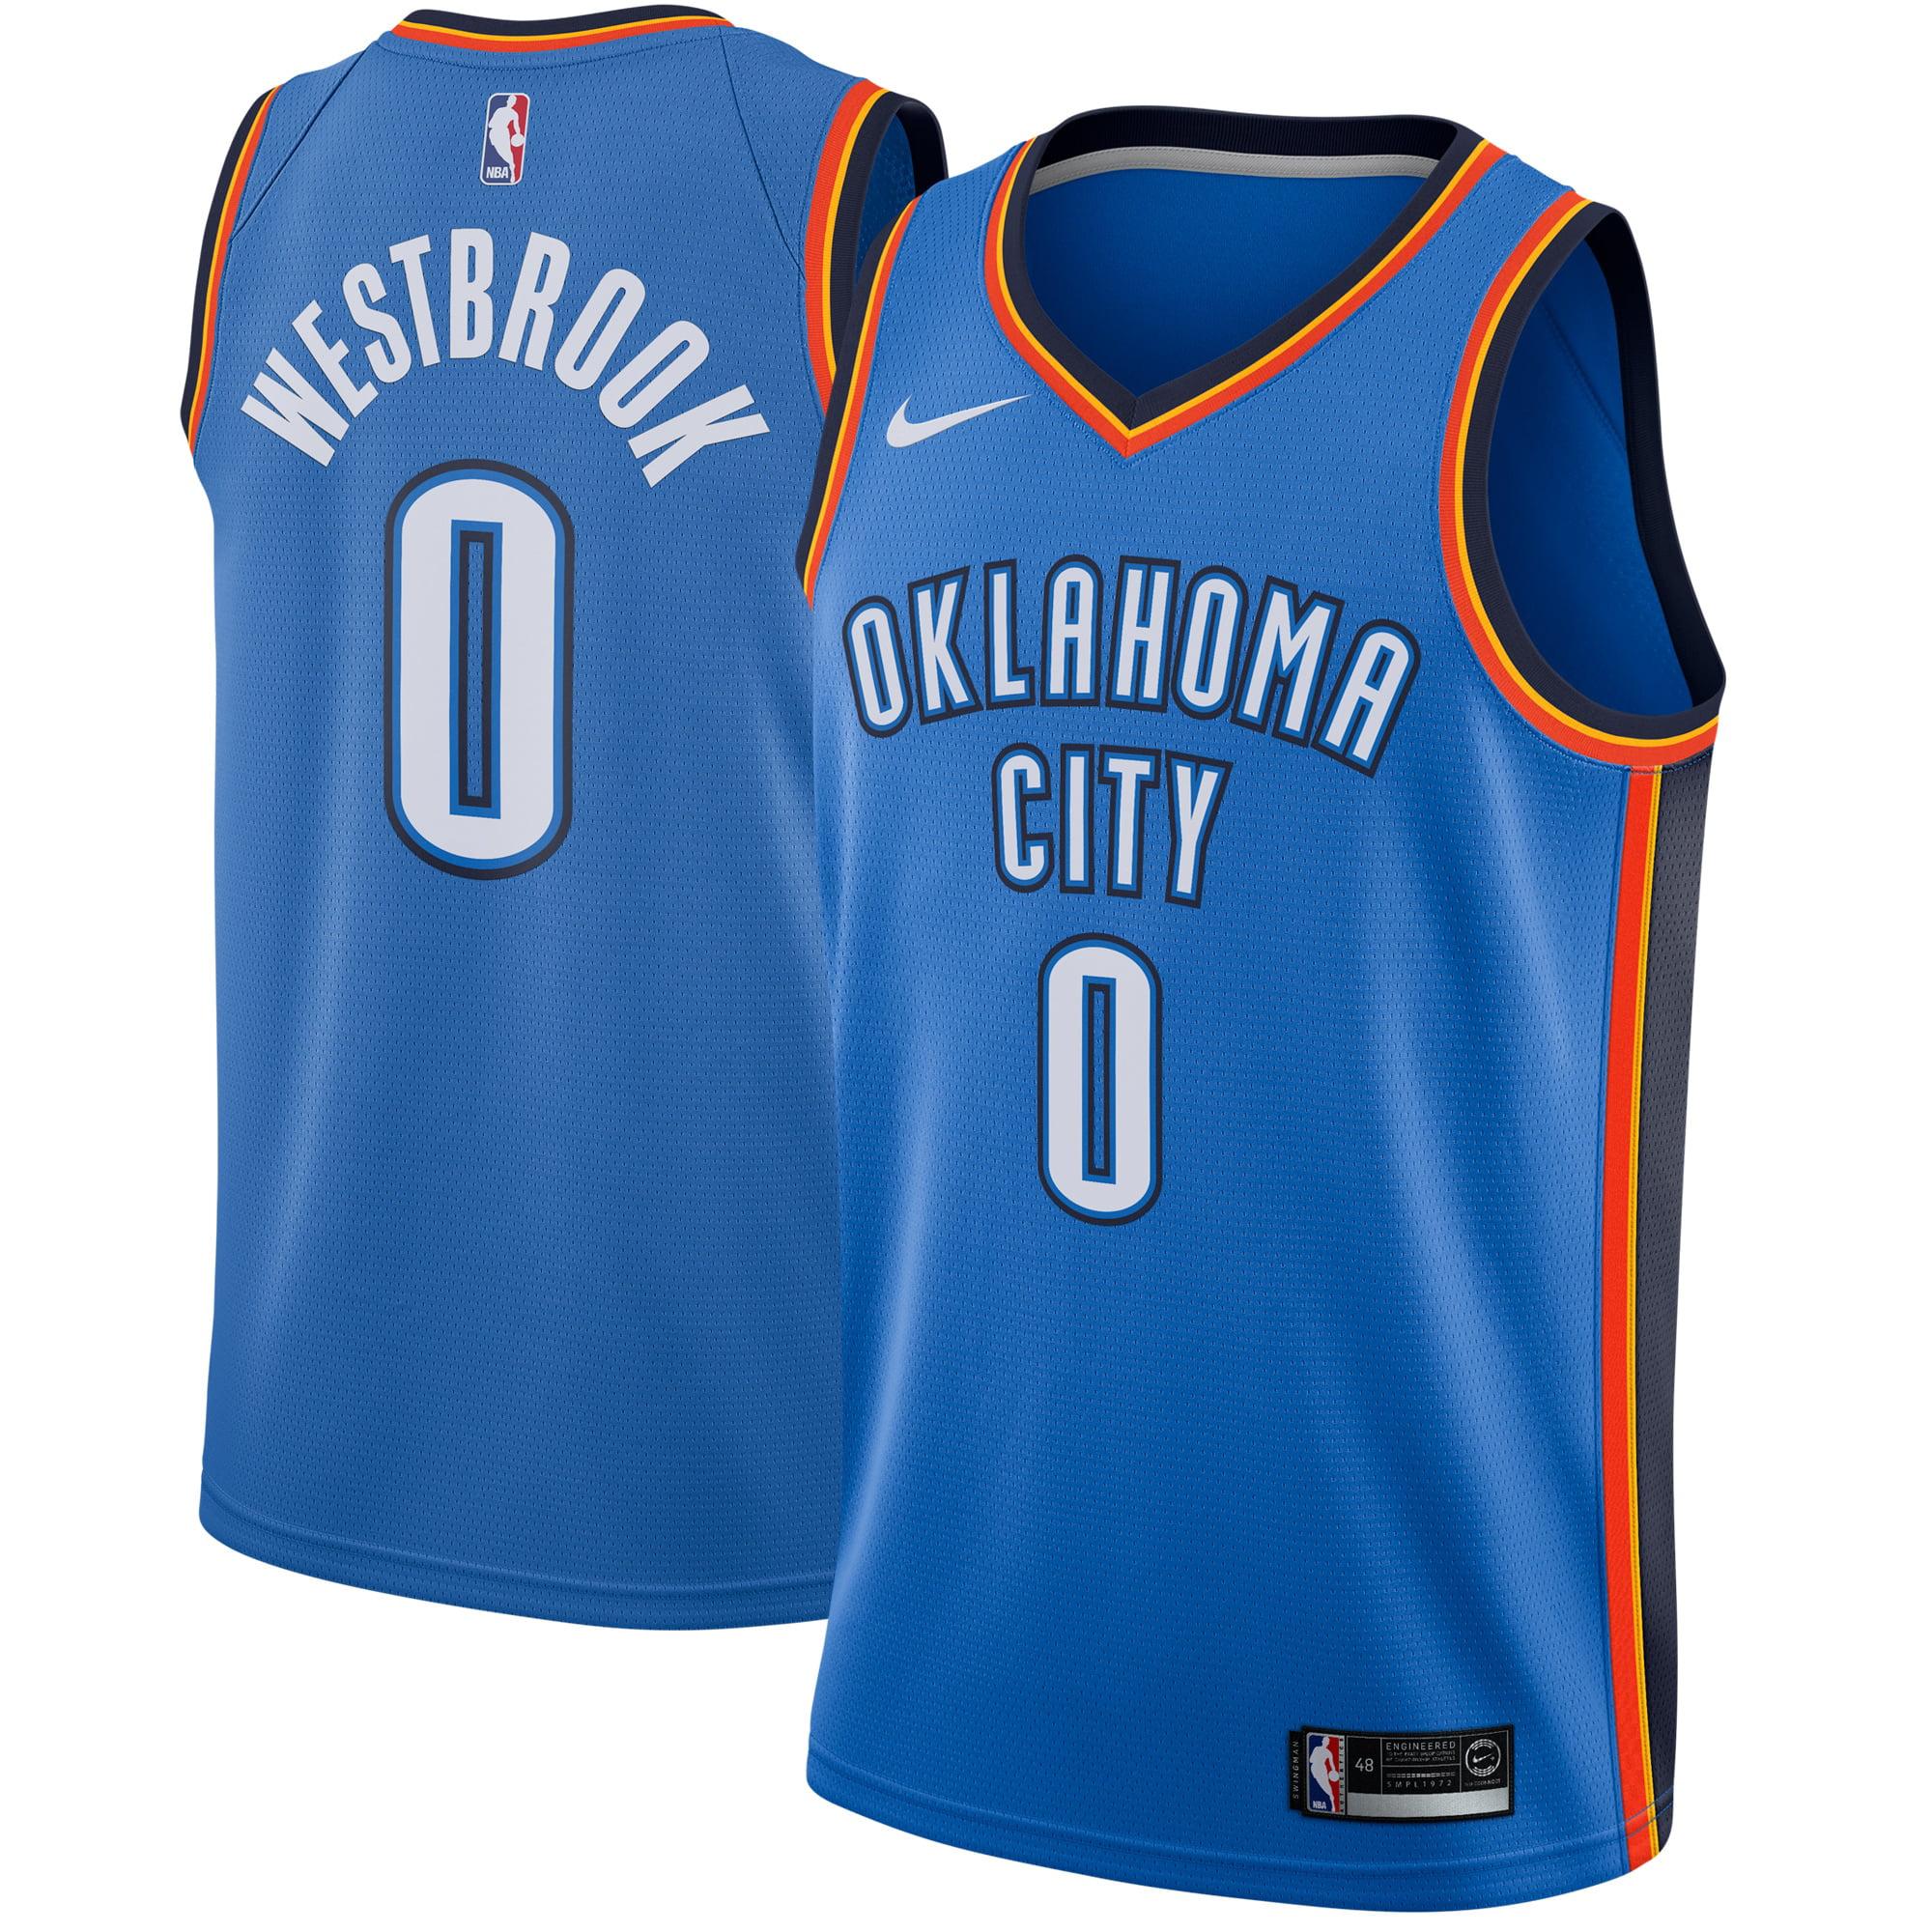 Russell Westbrook Oklahoma City Thunder Nike Swingman Jersey Blue - Icon Edition - Walmart.com